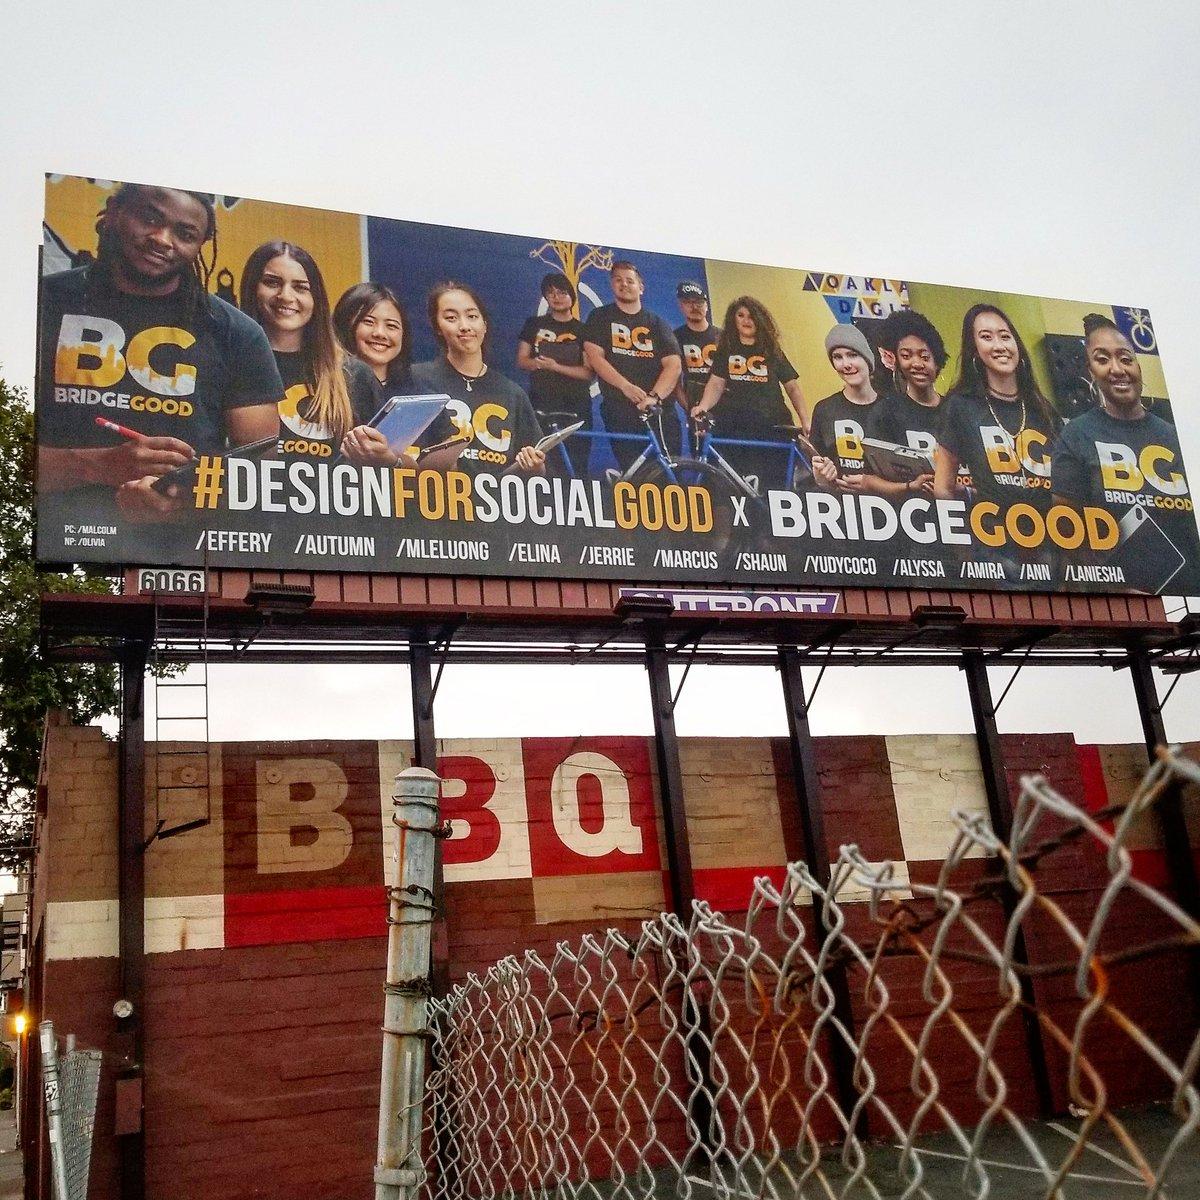 Incredibly honored to work alongside dynamic, creative, and inspiring leaders. #DesignForSocialGood with #BRIDGEGOOD + #OaklandDigital | 48-feet of #billboard #inspiration at Linden St. &amp; 34th St. in #Oakland | #InspireOakland<br>http://pic.twitter.com/o8zocBSzlk